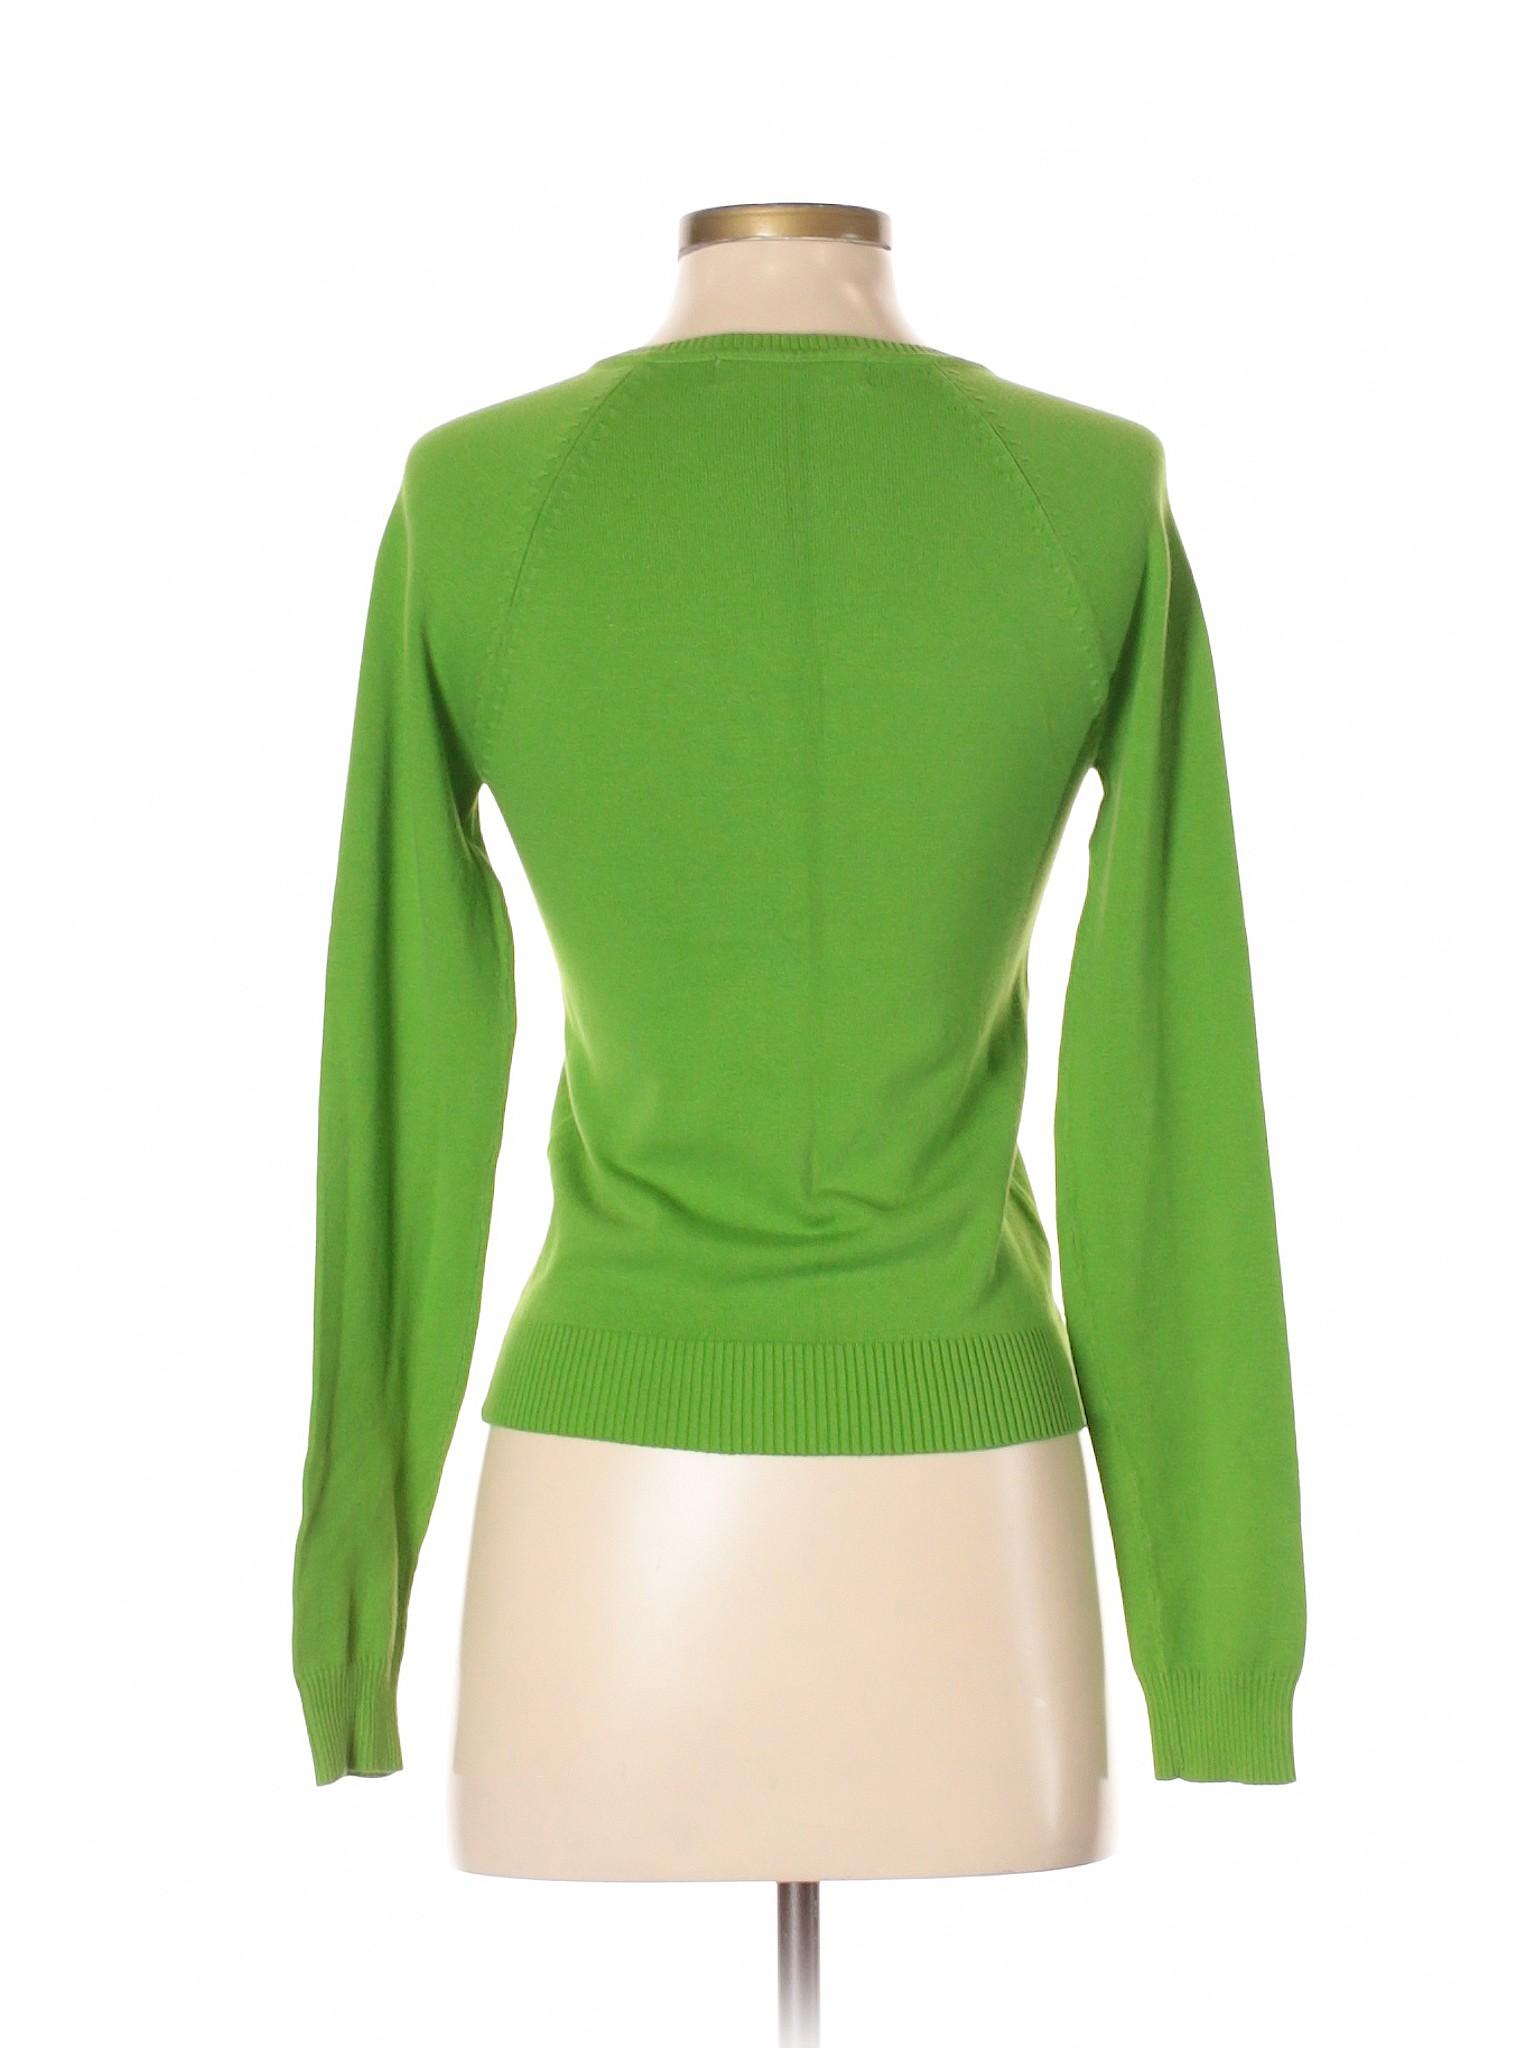 Boutique Pullover Boutique Boutique Pullover Zara Sweater Zara Sweater Pullover Zara fWBZfrRq